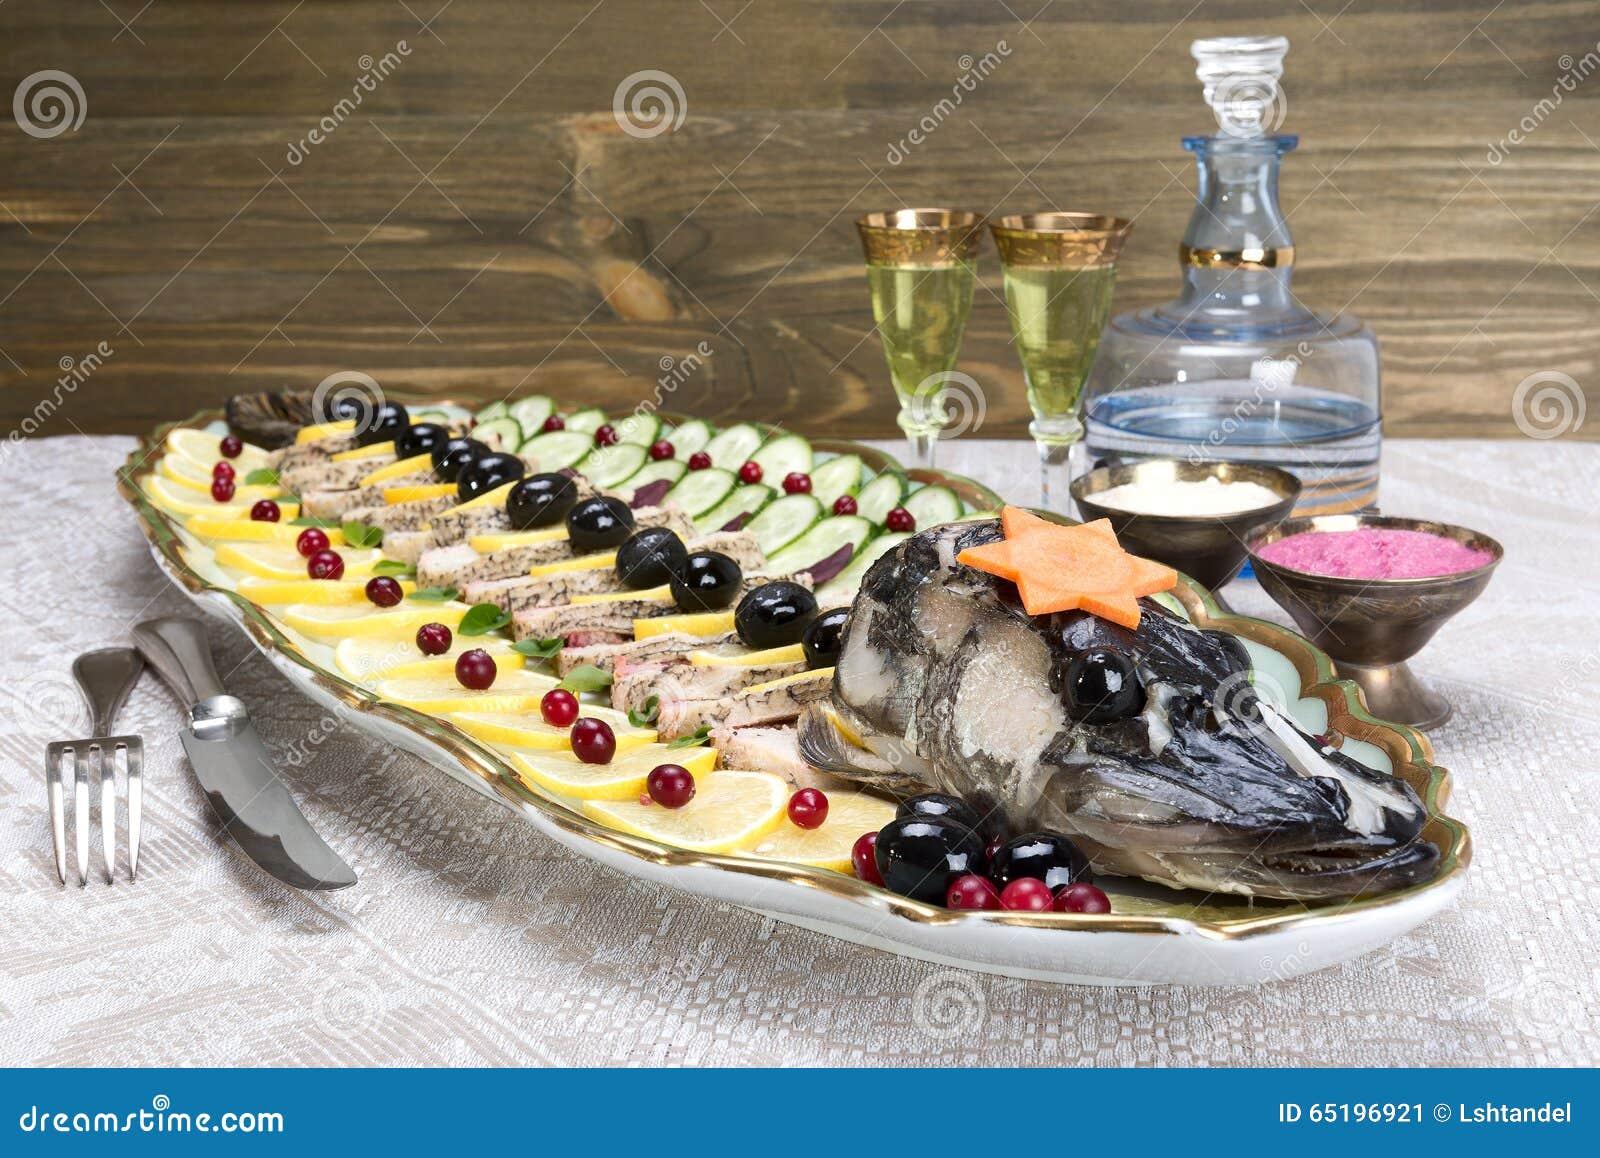 Gefilte fish stuffed fish stuffed pike stock photo for Jewish fish dish